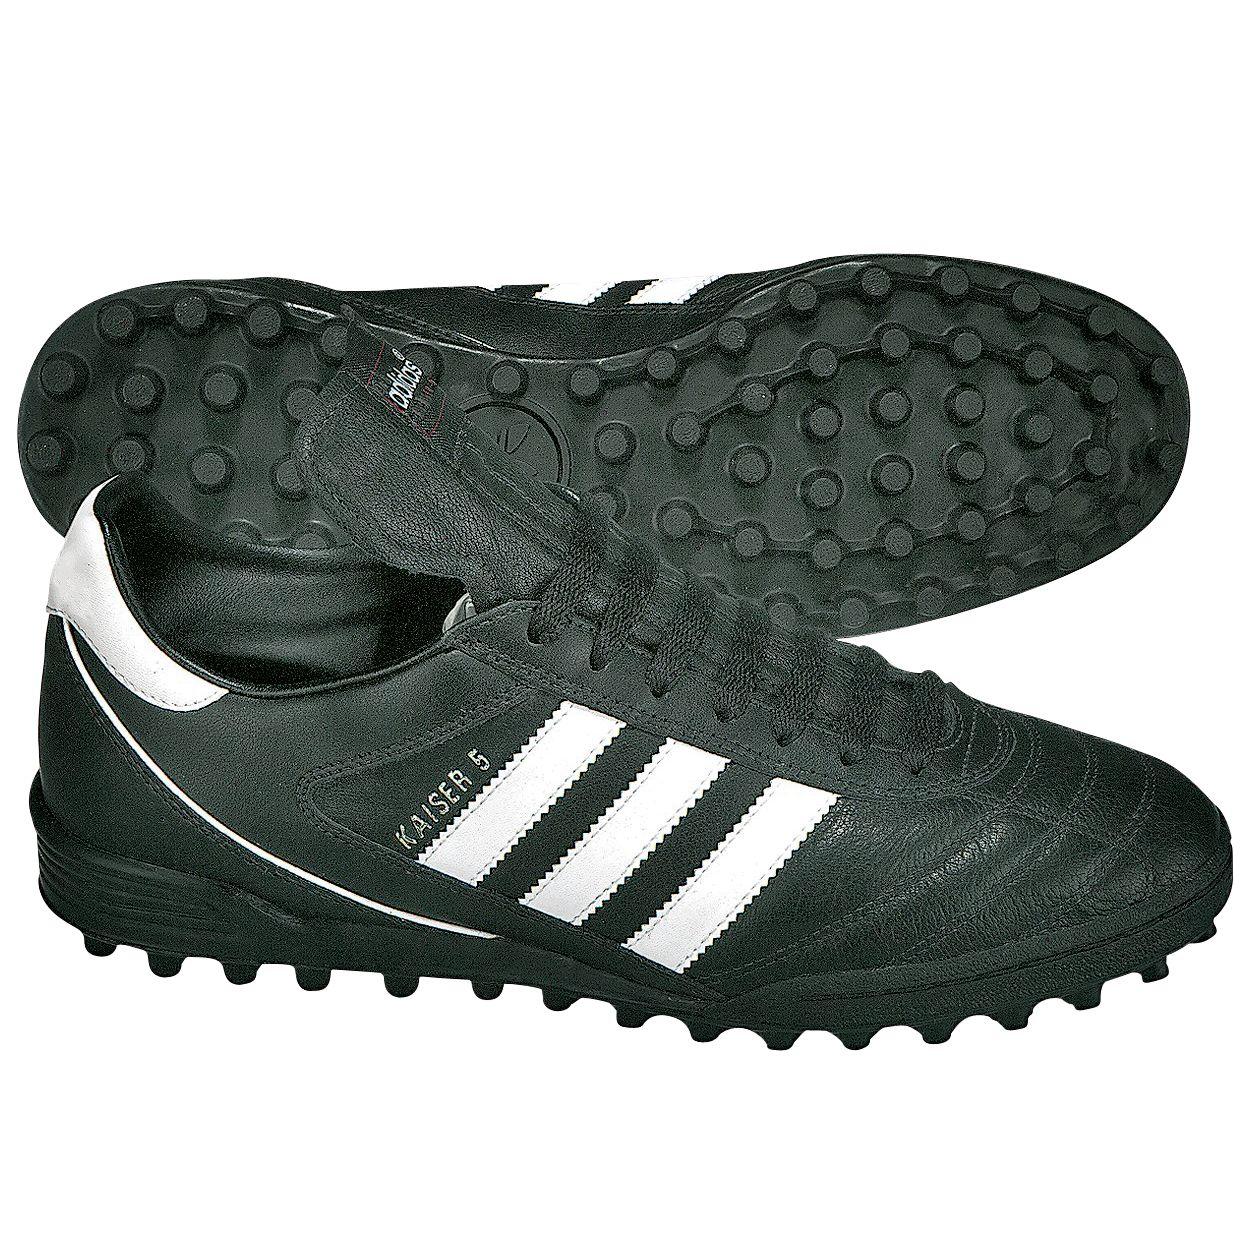 c79e5e20734 Adidas Kaiser 5 Team Men's Astro Turf Football Boots at John Lewis ...